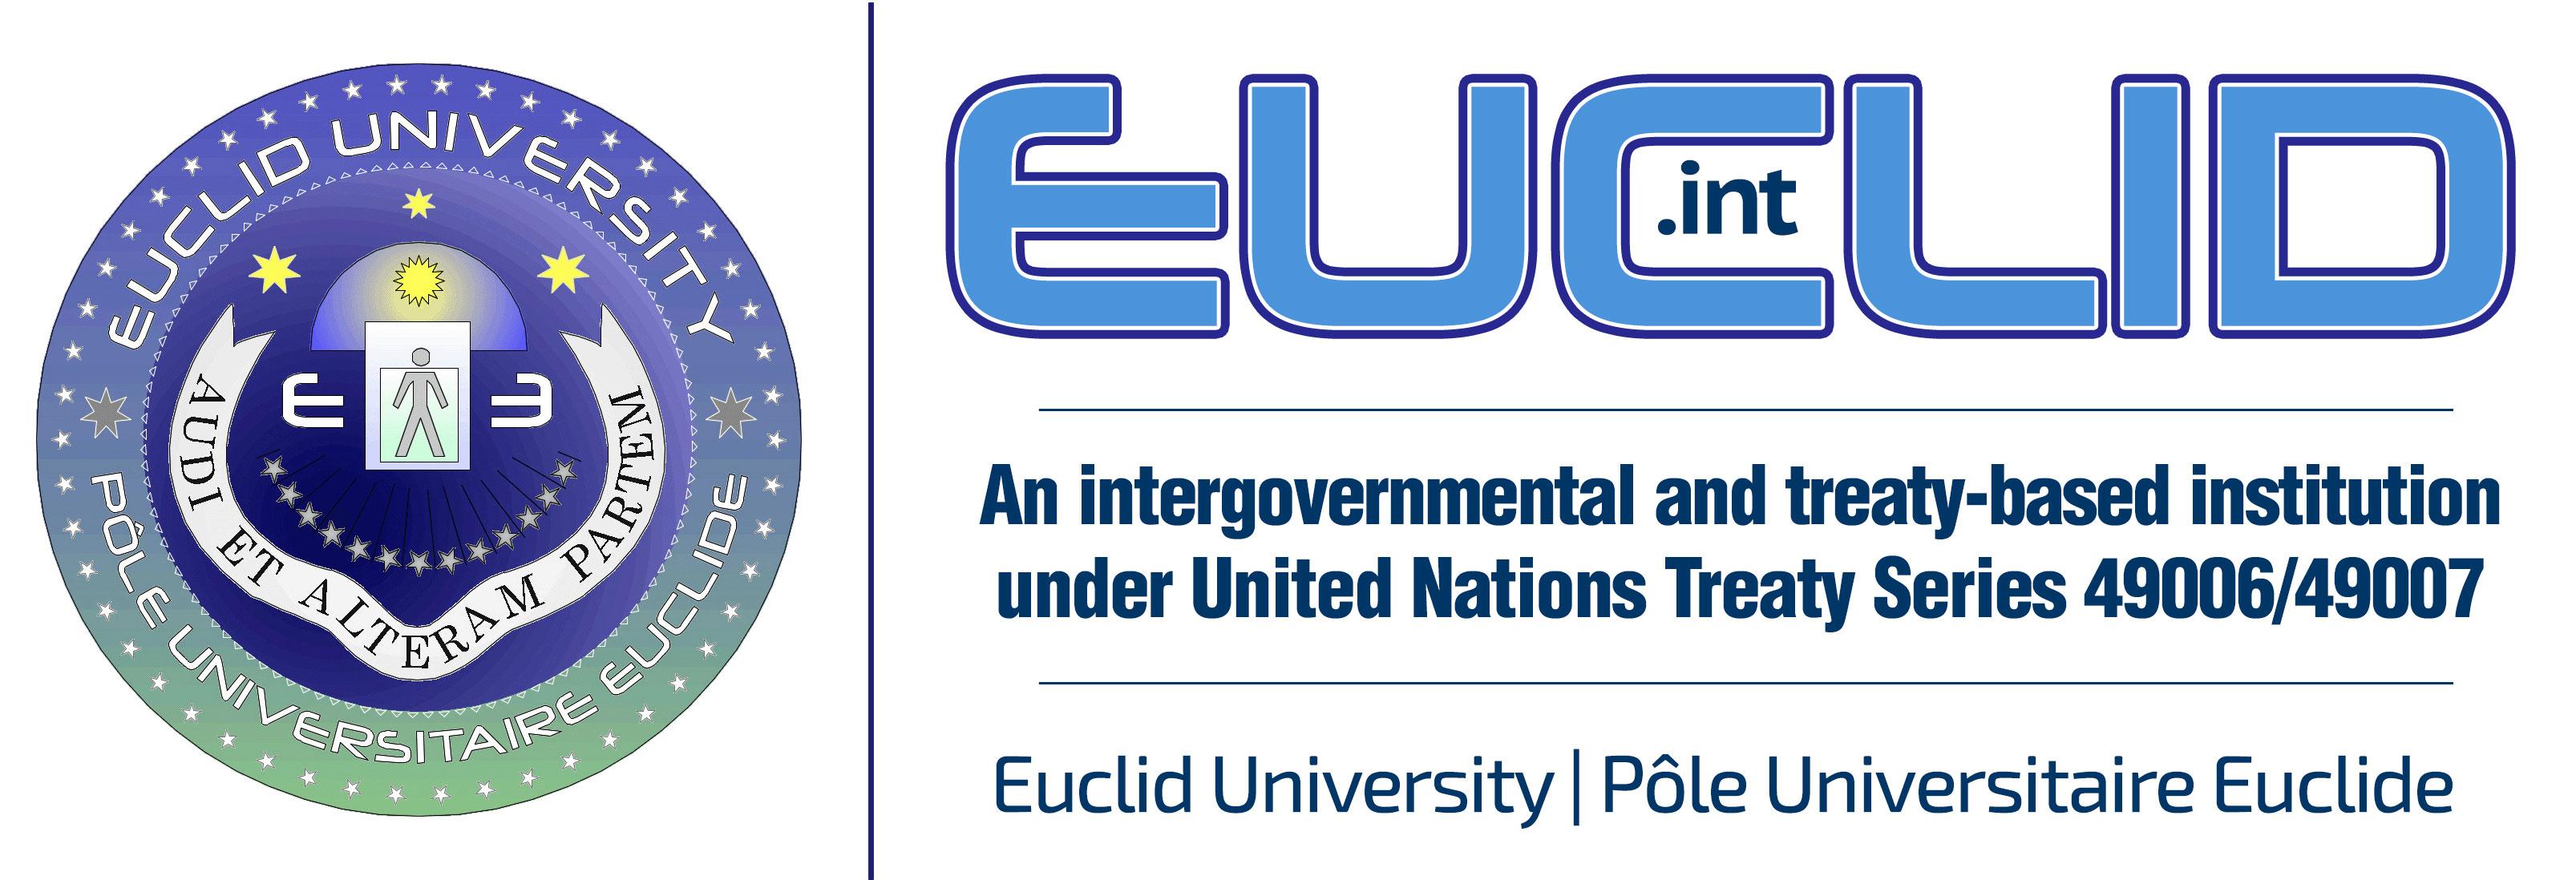 EUCLID University